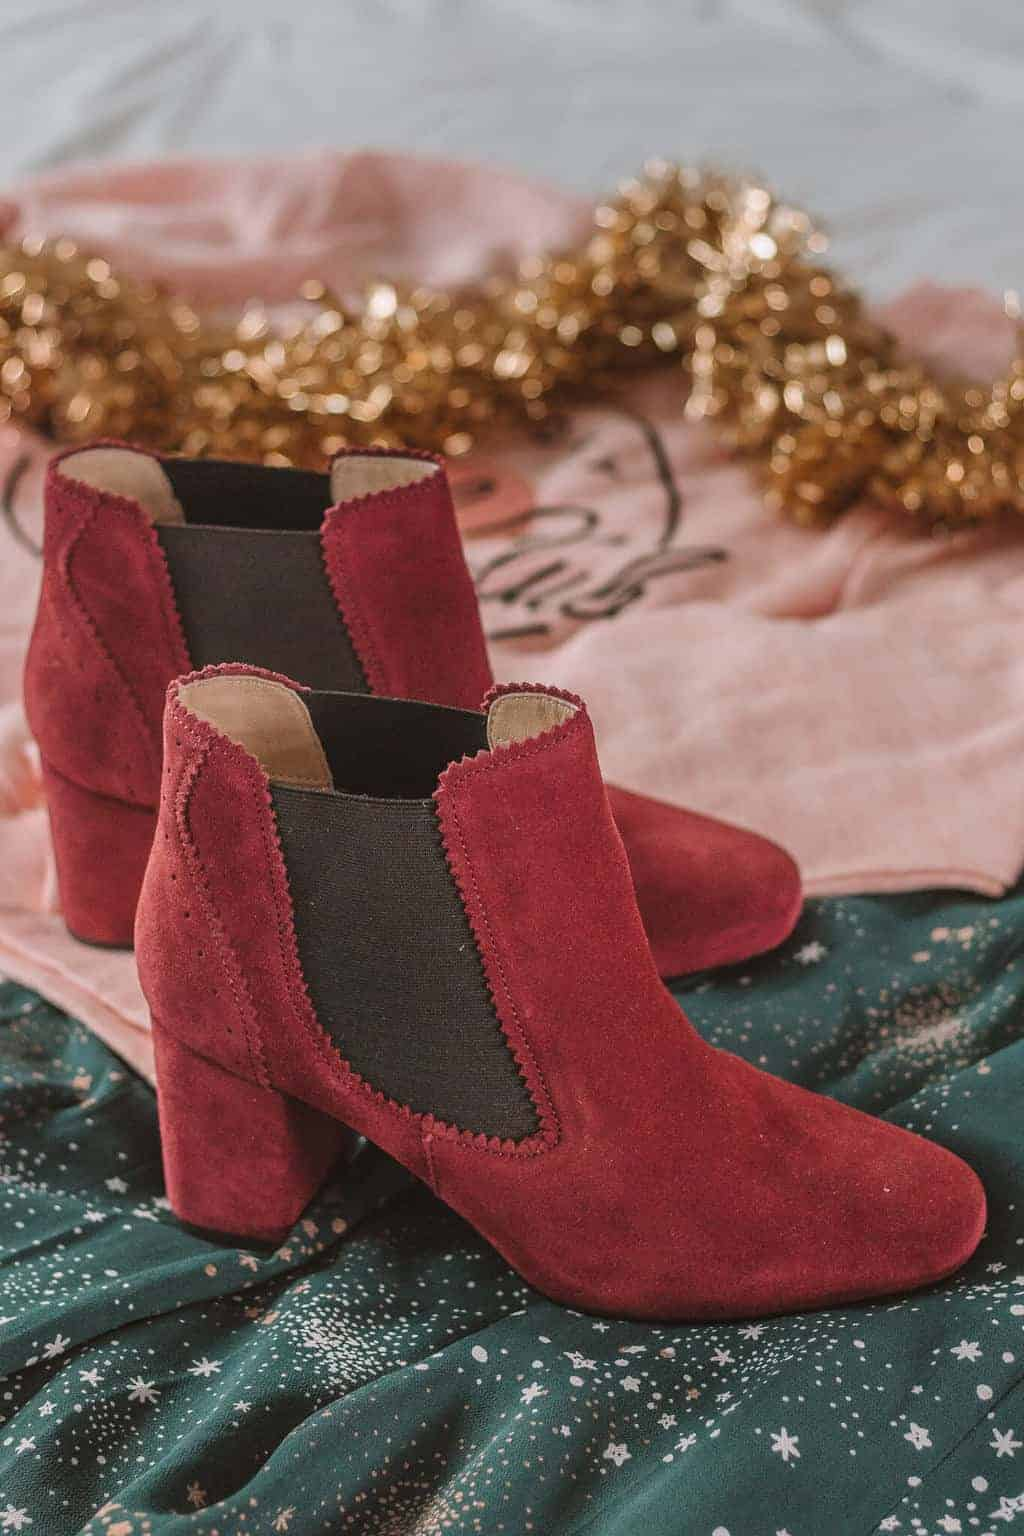 Burgundy Boots - Christmas Gift Guide 2018: Brilliant Christmas Gift Ideas For Her #whatshotblog